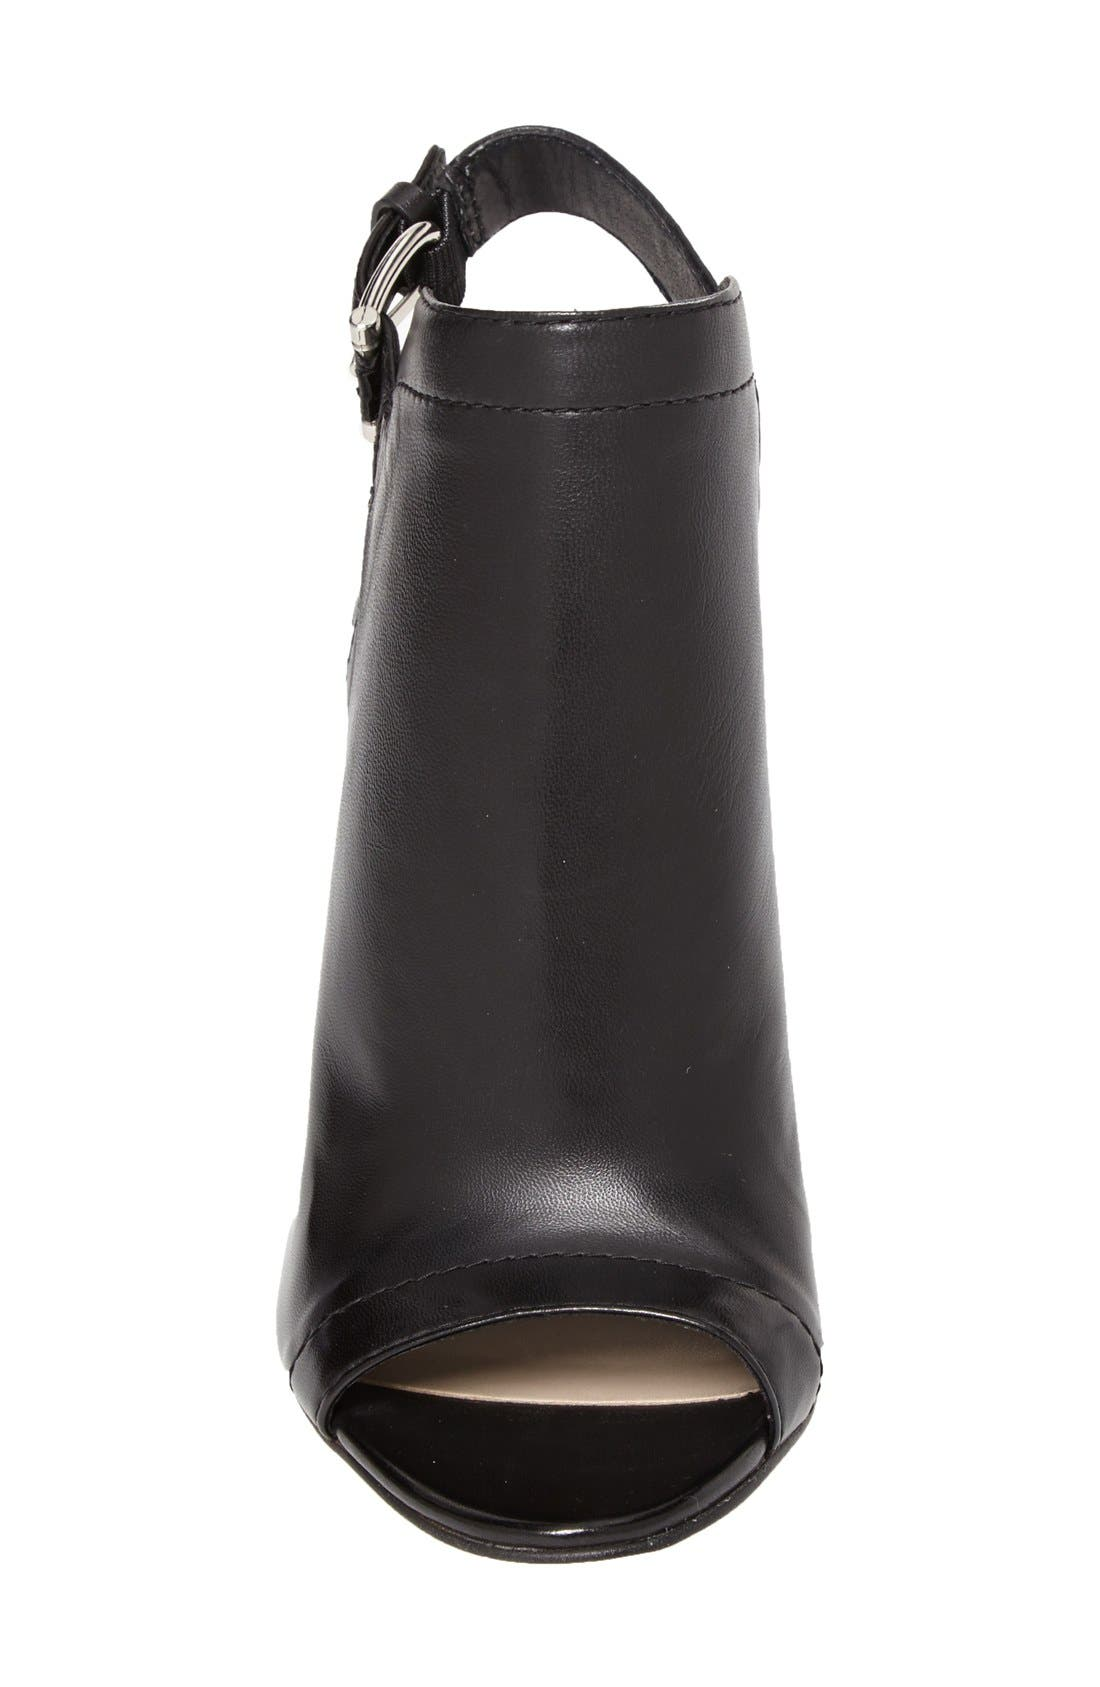 Alternate Image 3  - Vince Camuto 'Vamelia' Open Toe Leather Bootie (Women)